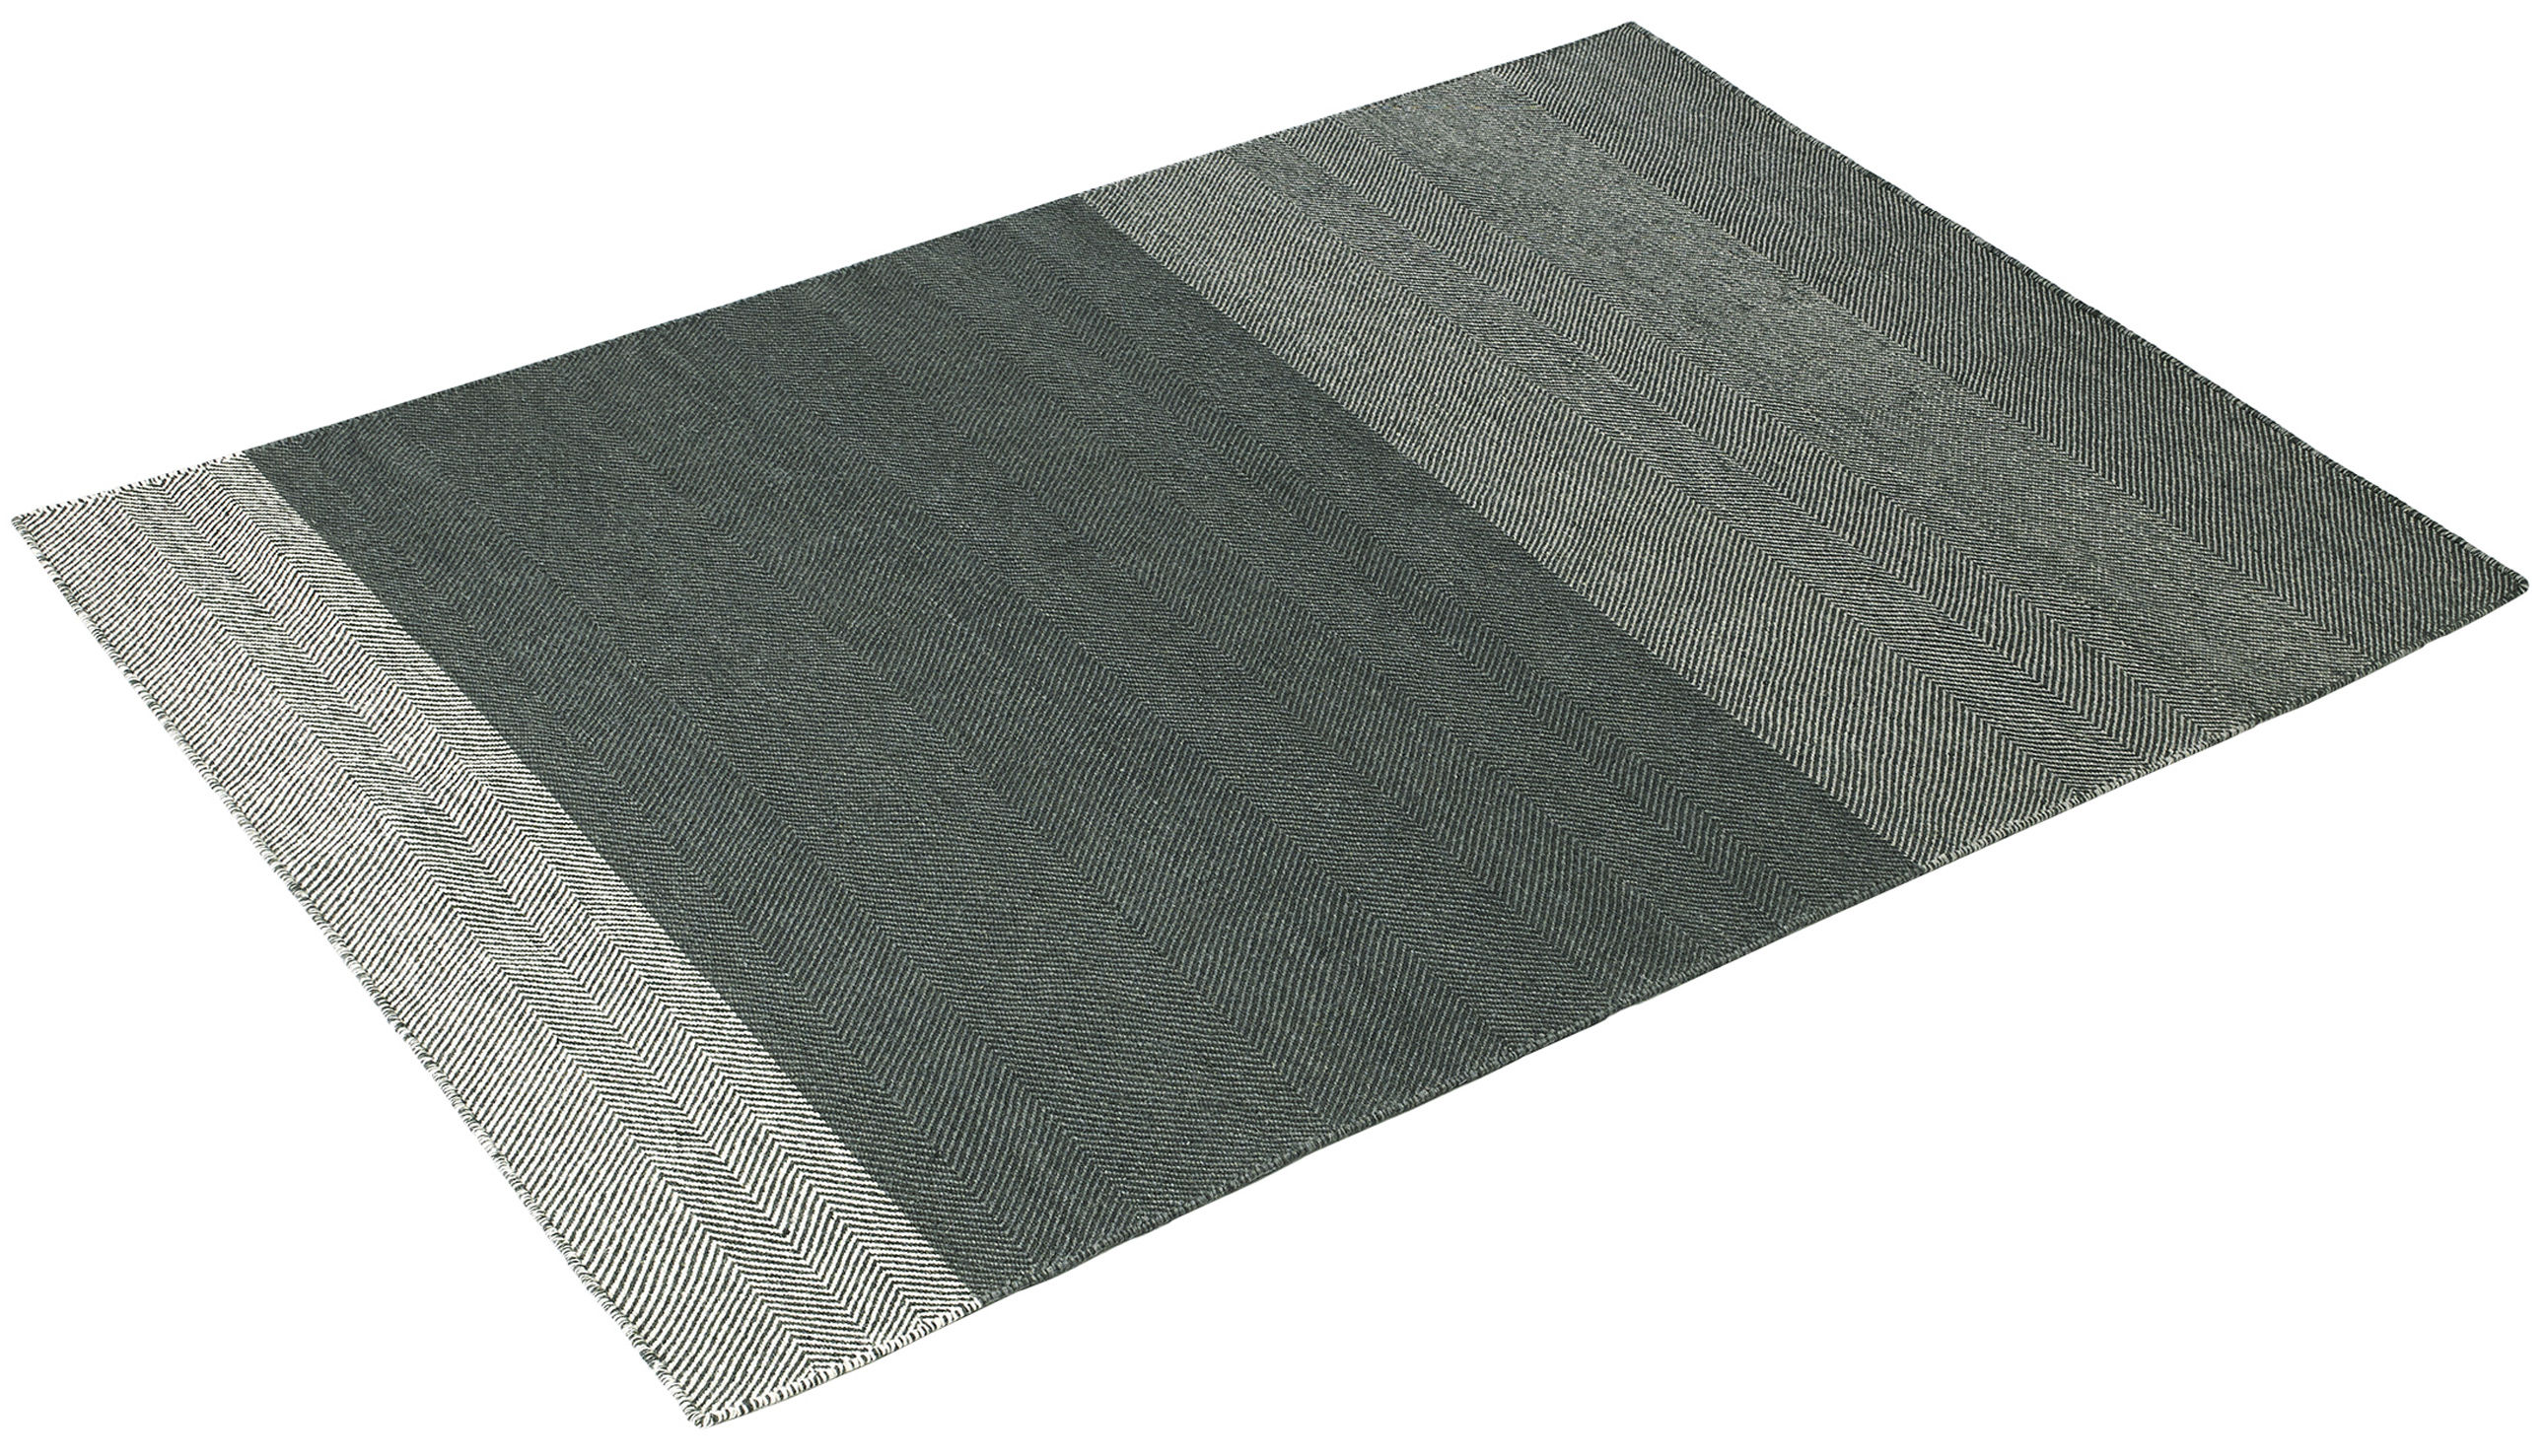 tapis varjo 200 x 300 cm gris vert fonc muuto. Black Bedroom Furniture Sets. Home Design Ideas